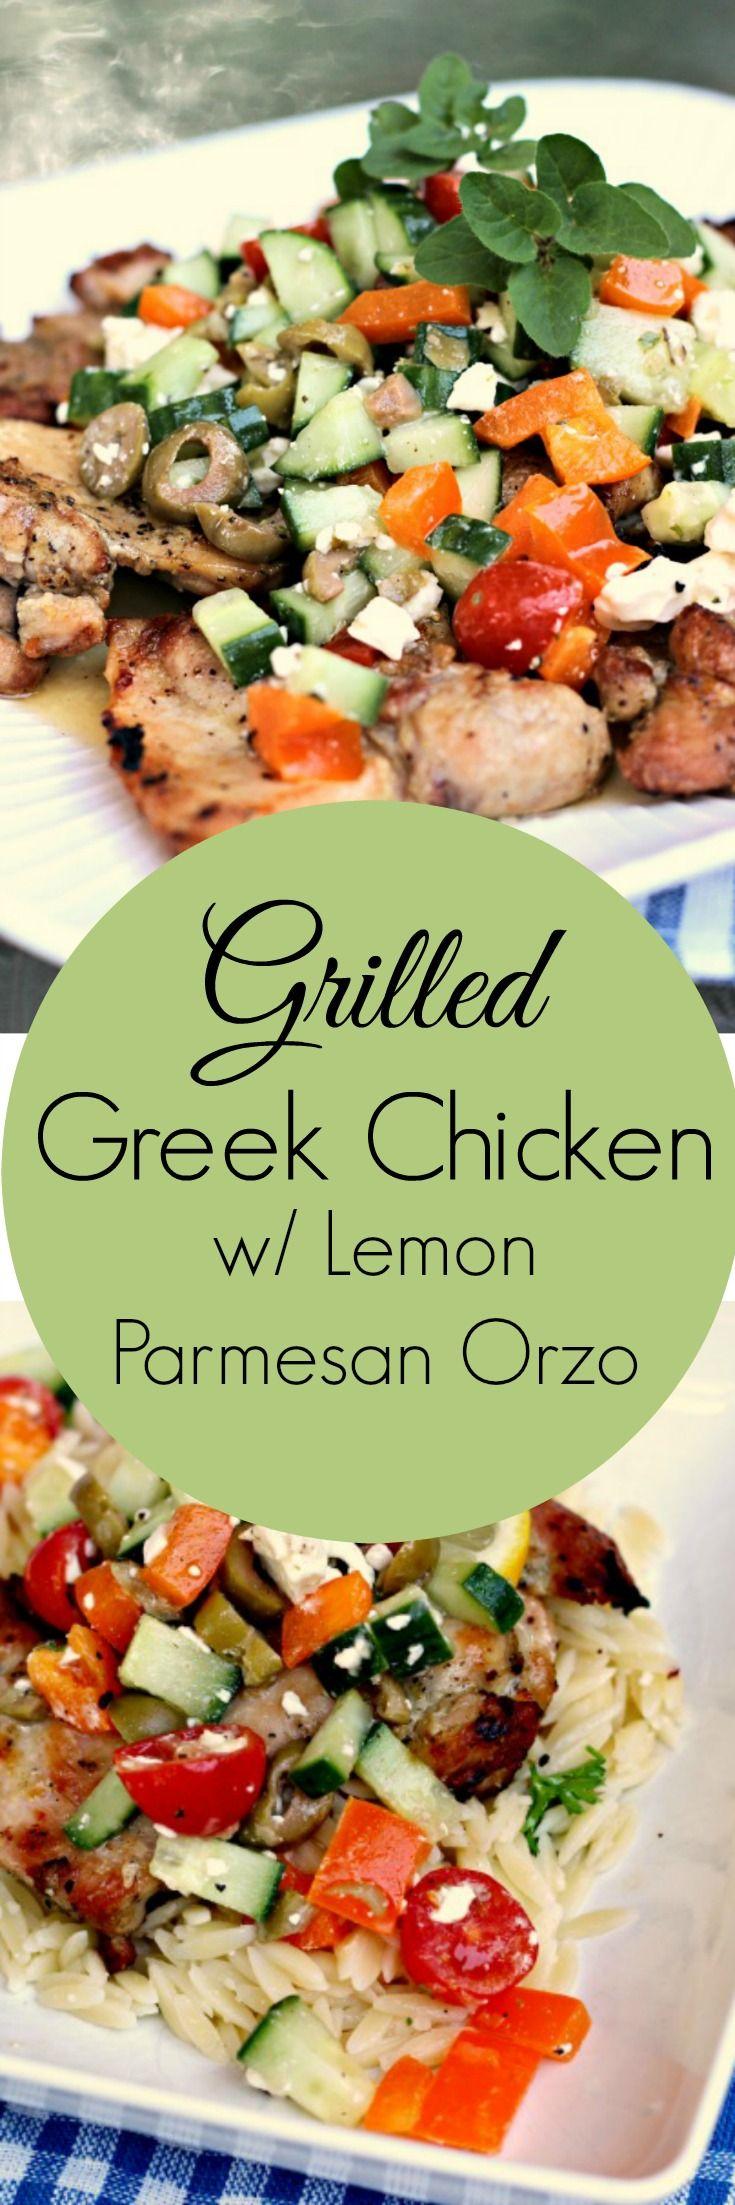 Grilled Greek Chicken Thighs w/ Lemon-Parmesan Orzo | Renee's Kitchen ...